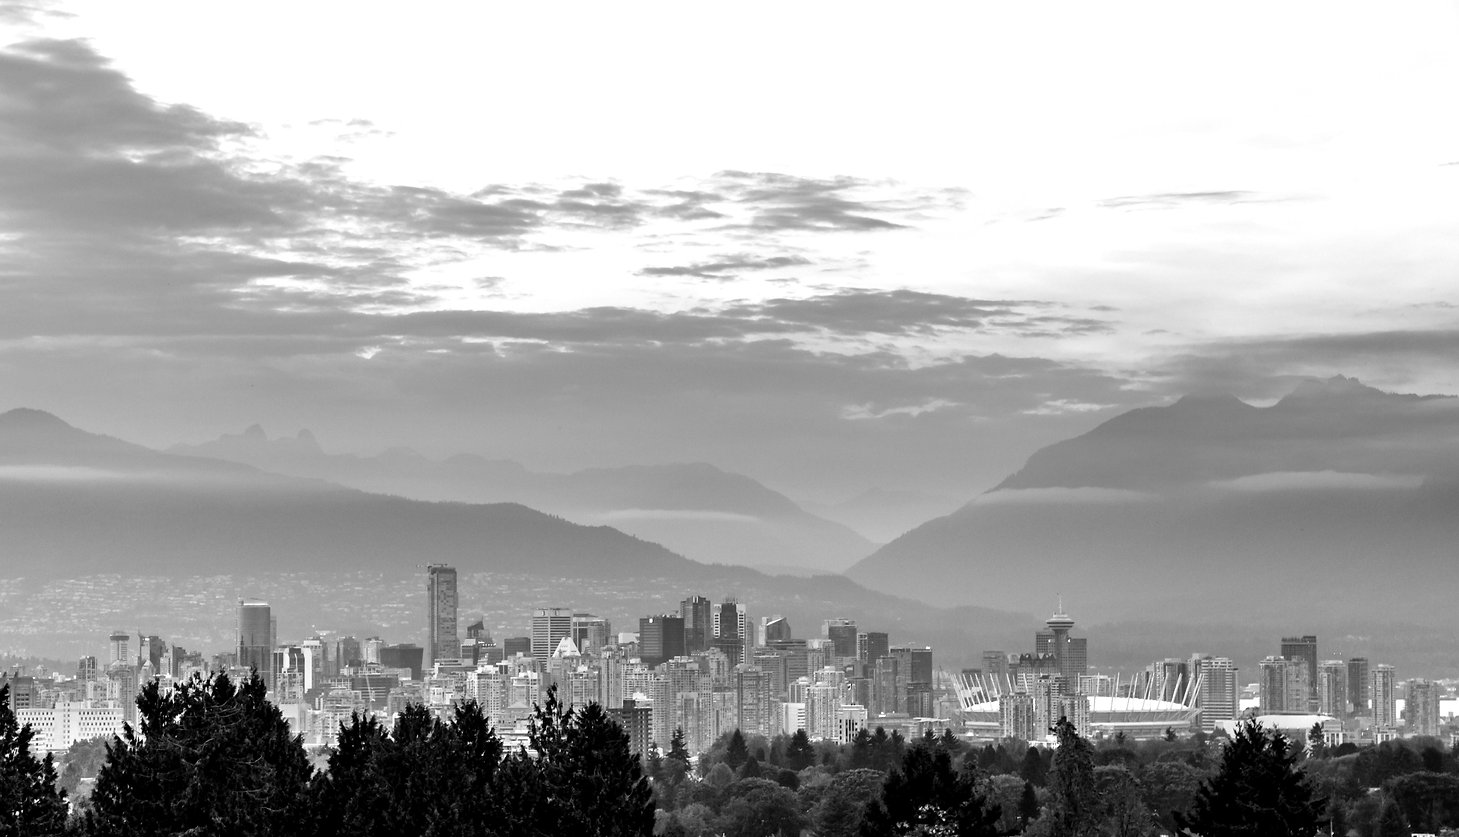 vancouver-skyline-at-dusk-P3DDRFJ_edited